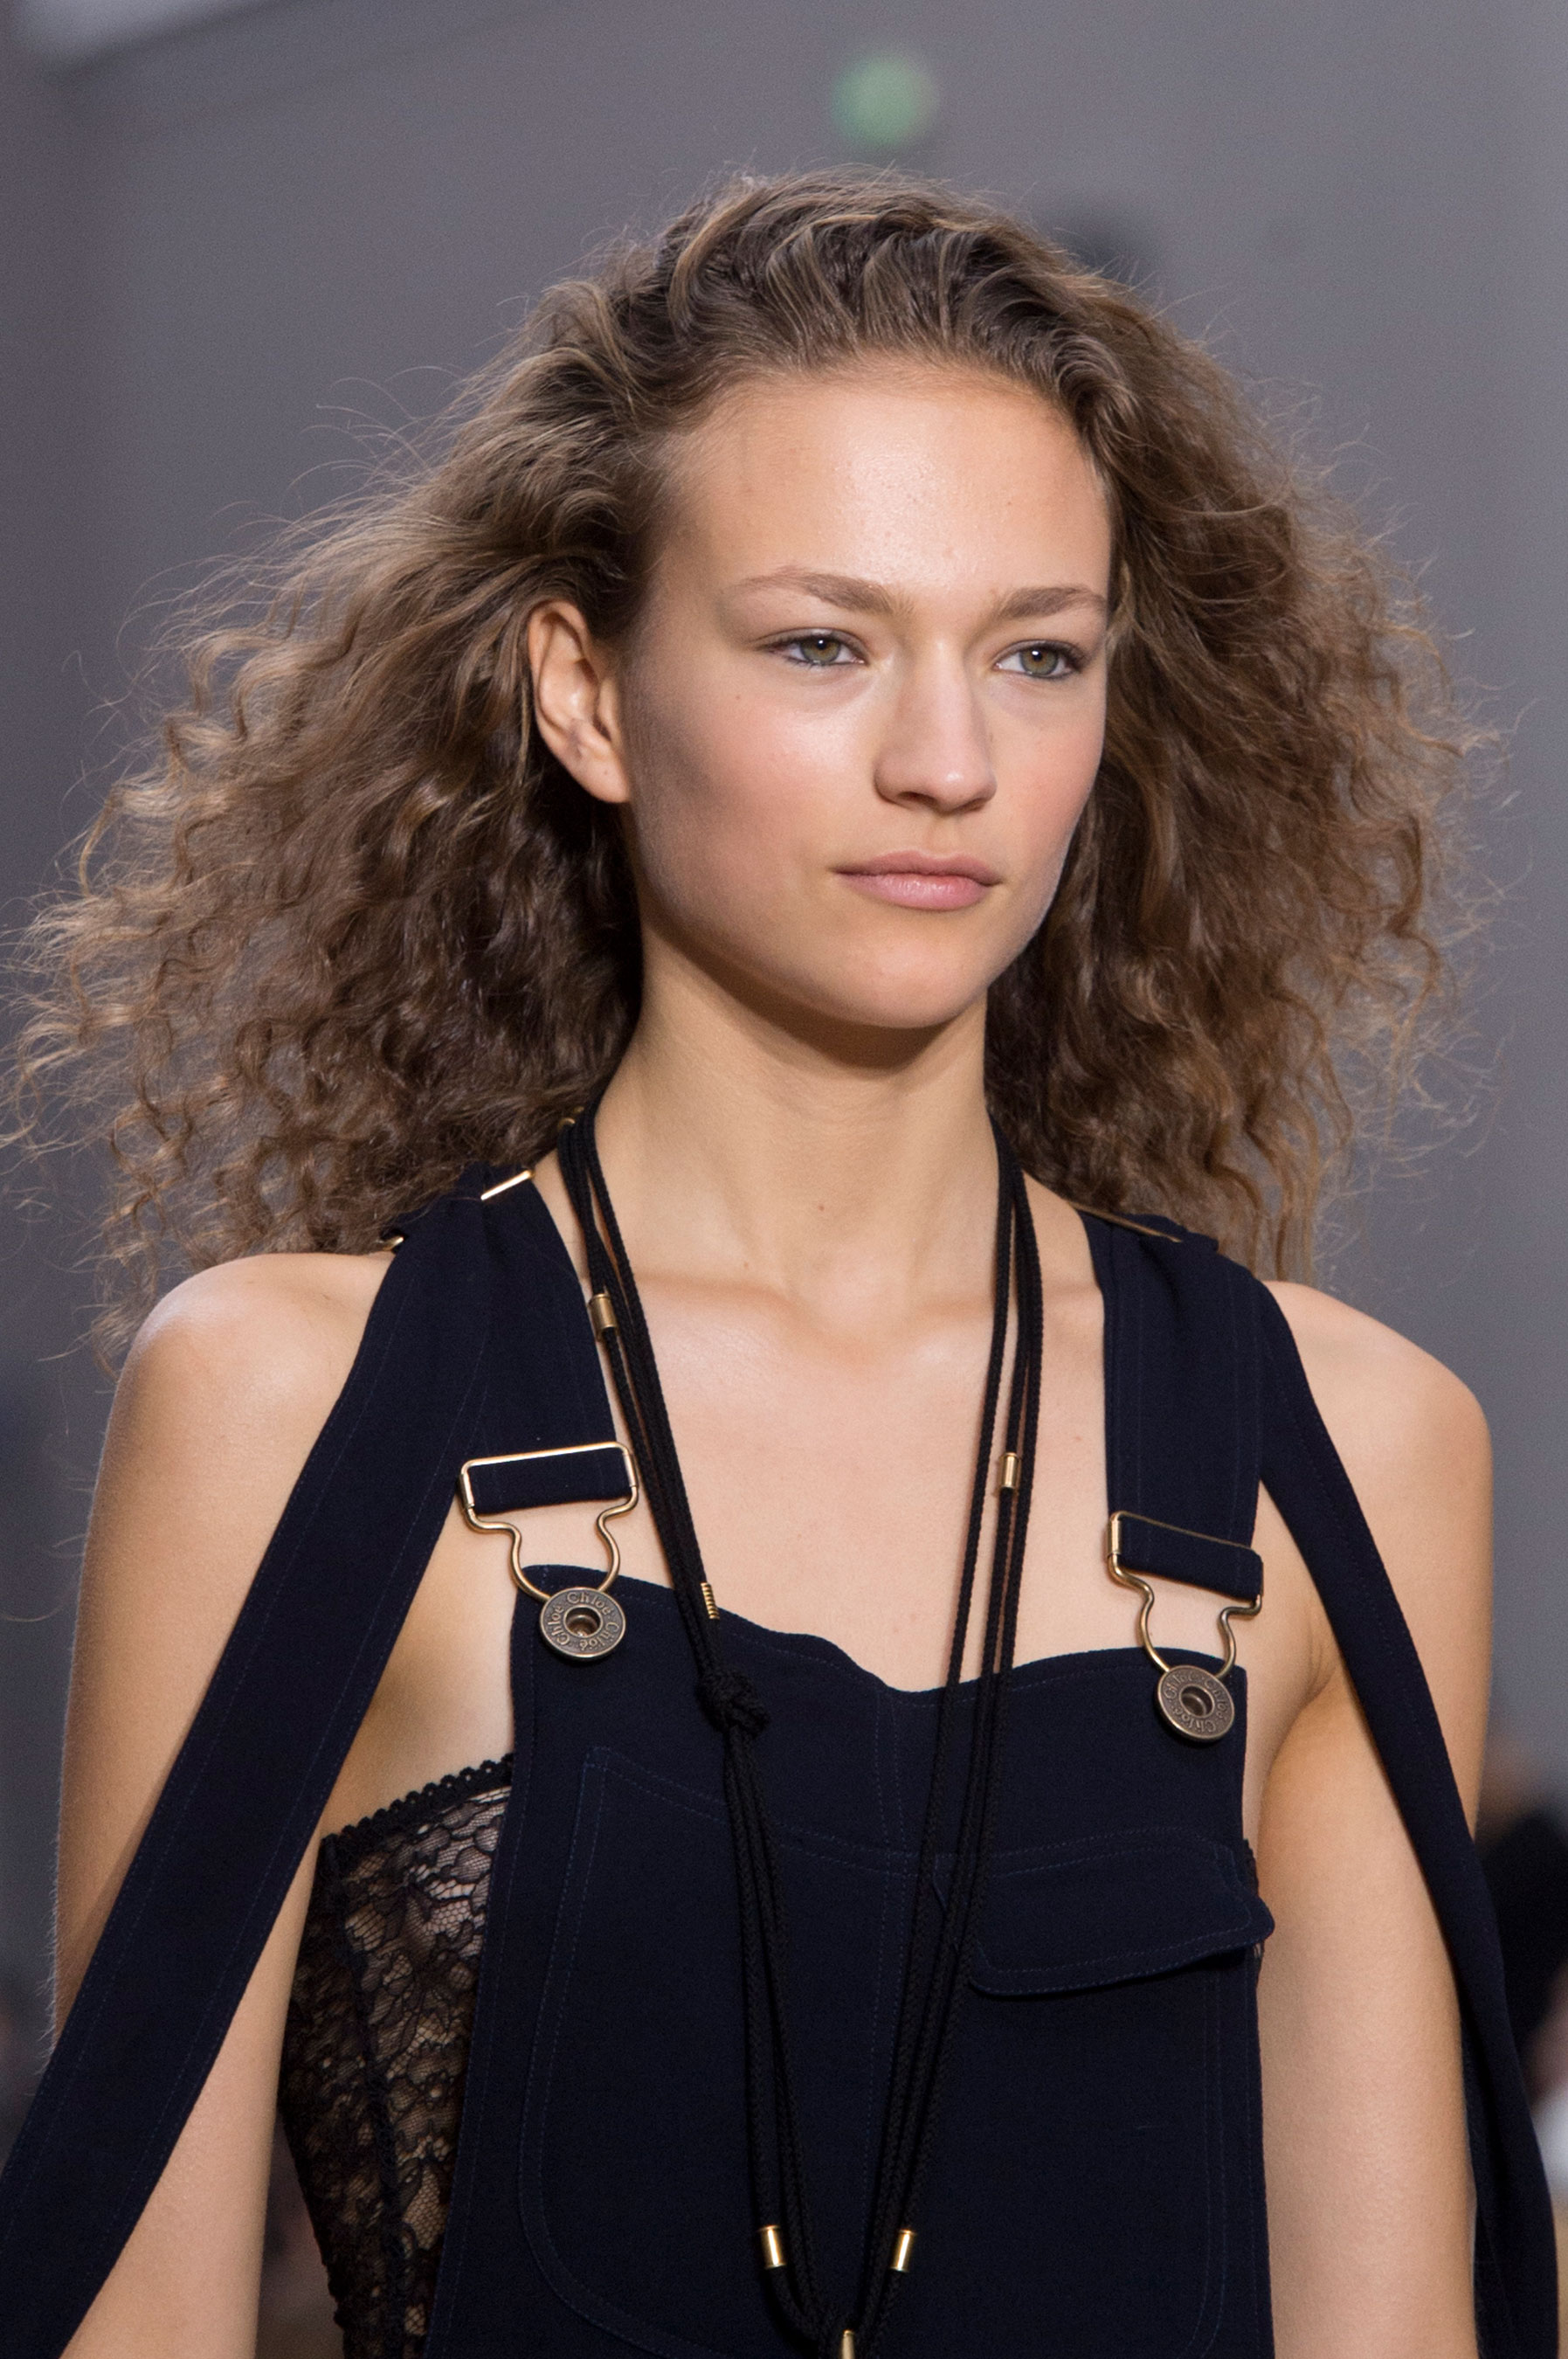 Chloe-spring-2016-runway-beauty-fashion-show-the-impression-21